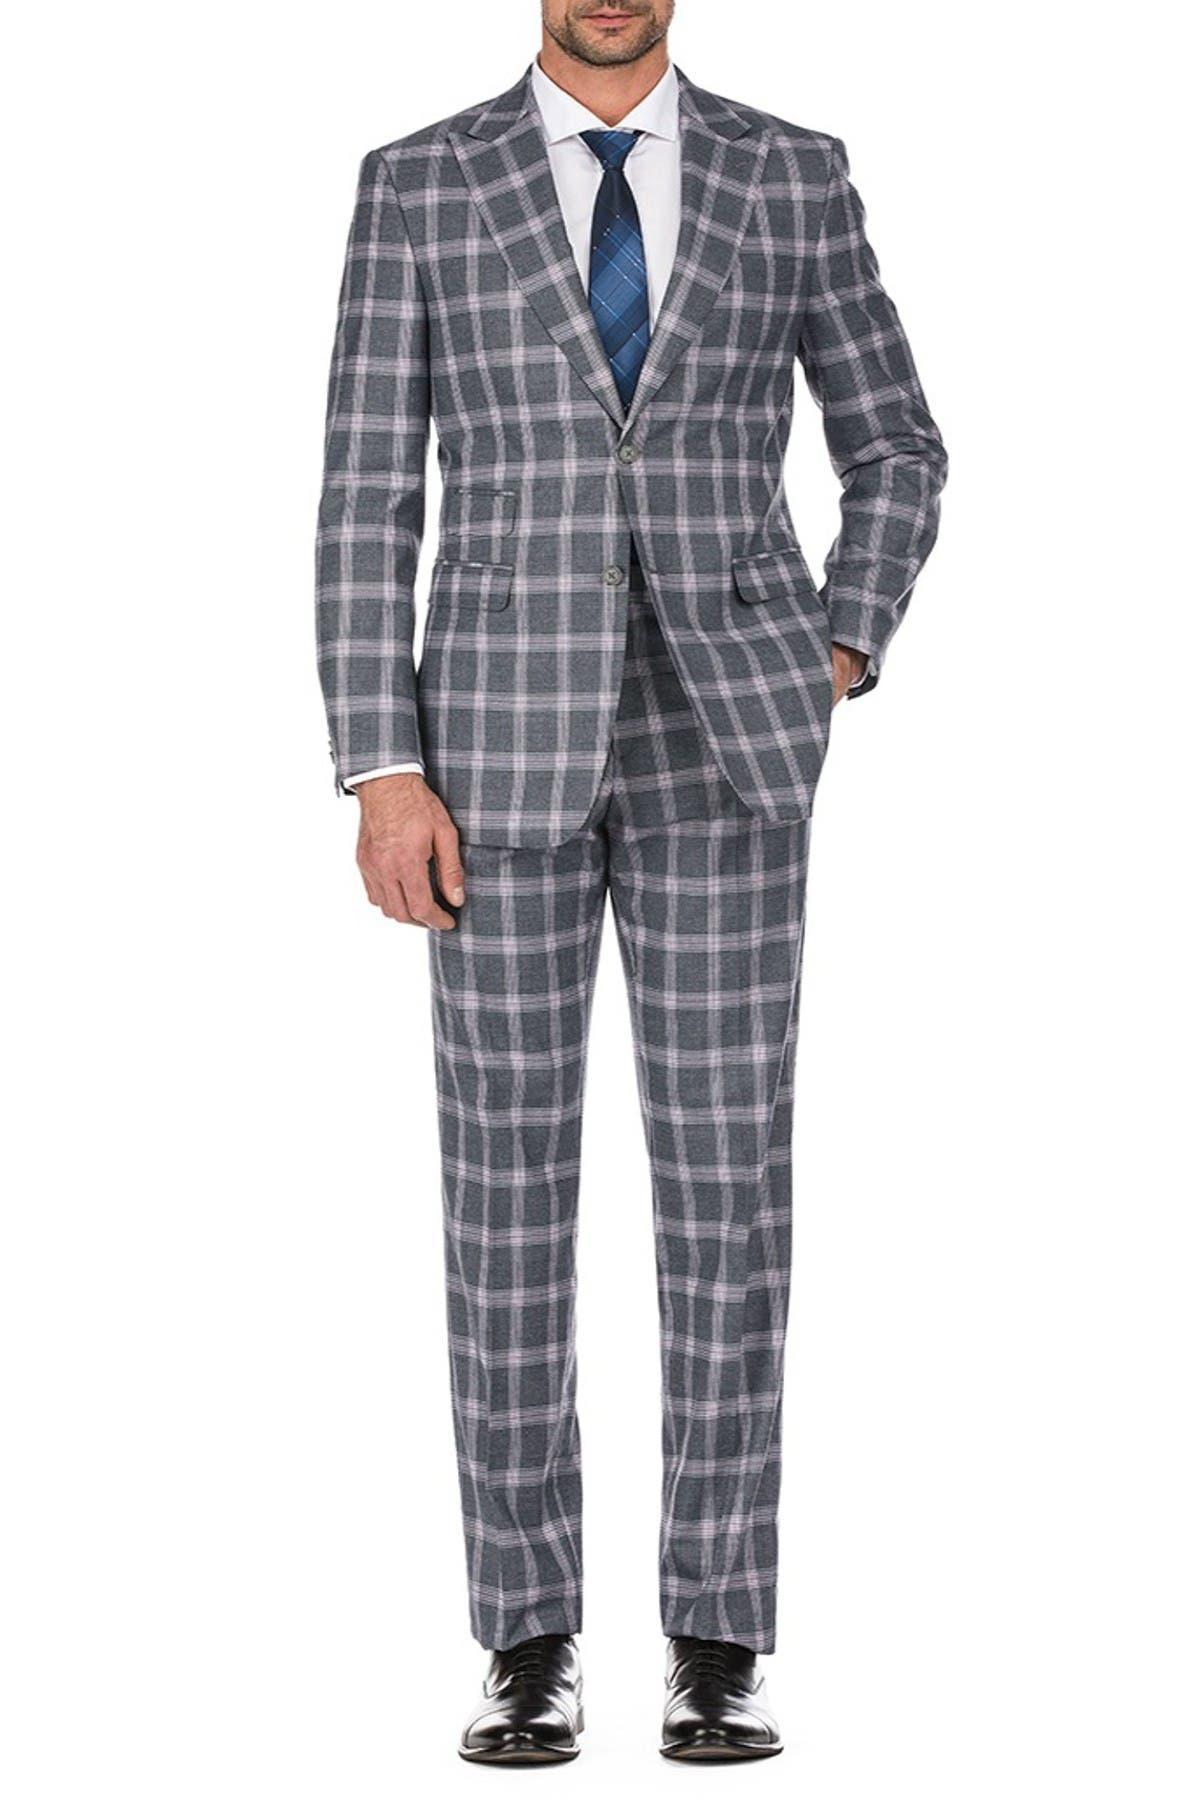 Image of English Laundry Gray Plaid Slim Fit Peak Lapel Suit